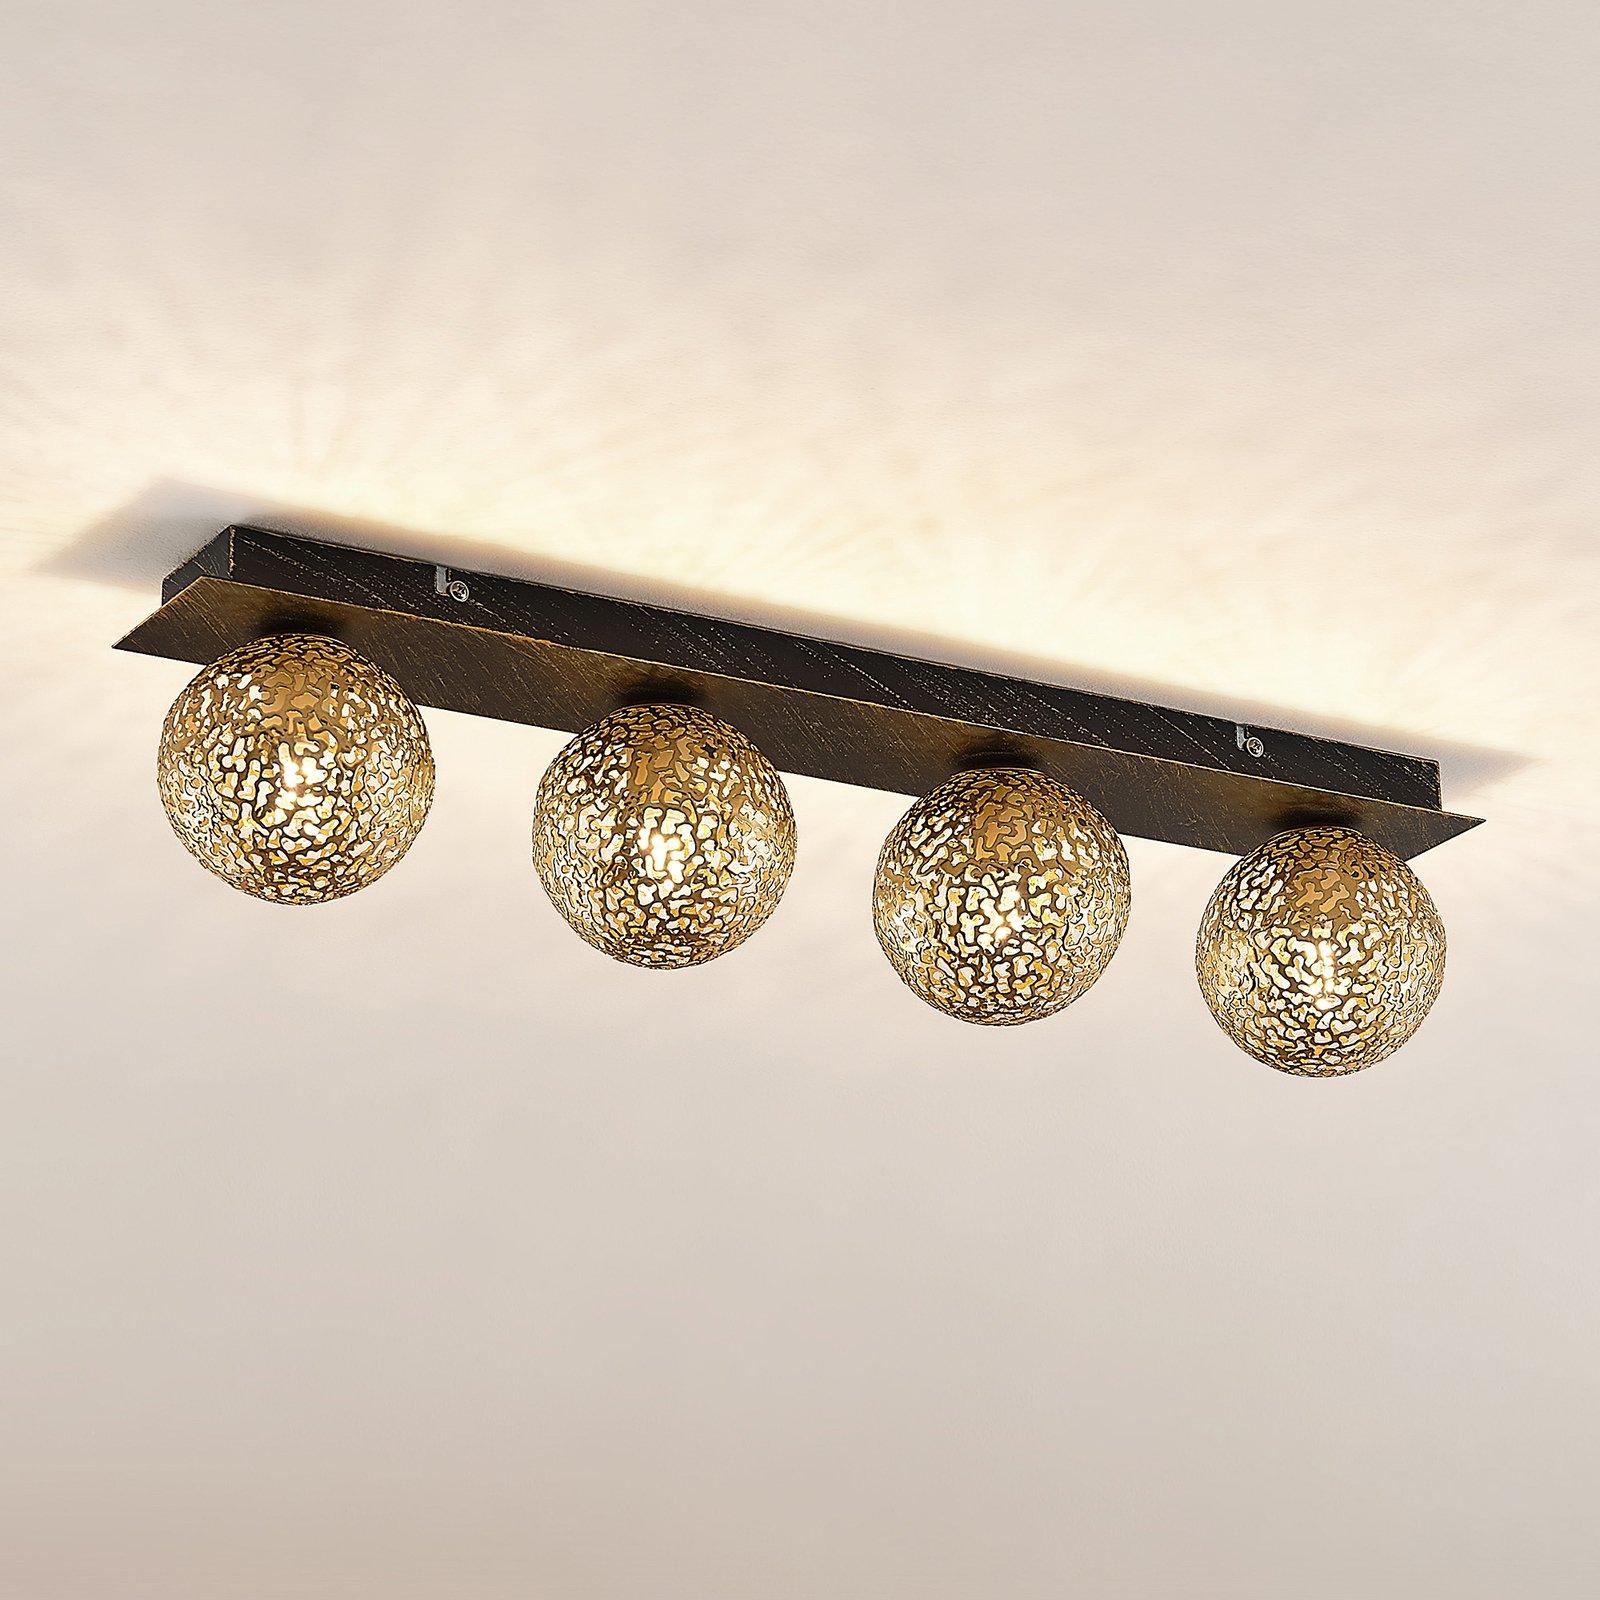 Lucande Evory taklampe, kantet, 4 lyskilder